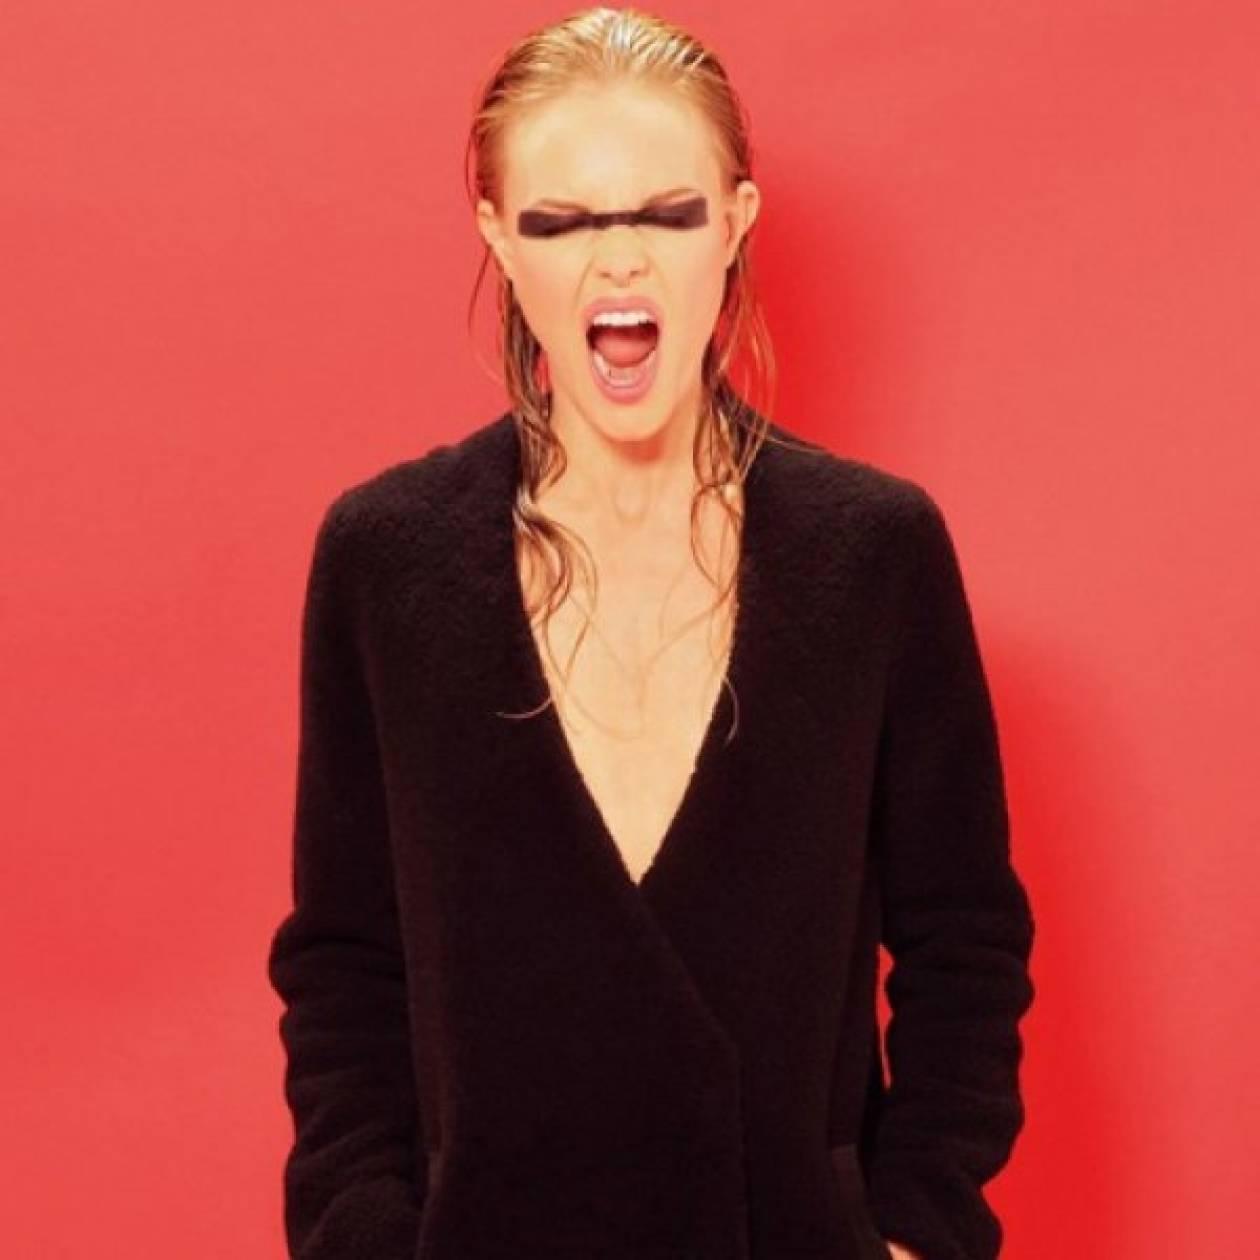 H Kate Bosworth συνεργάζεται ξανά με το Topshop (βίντεο)